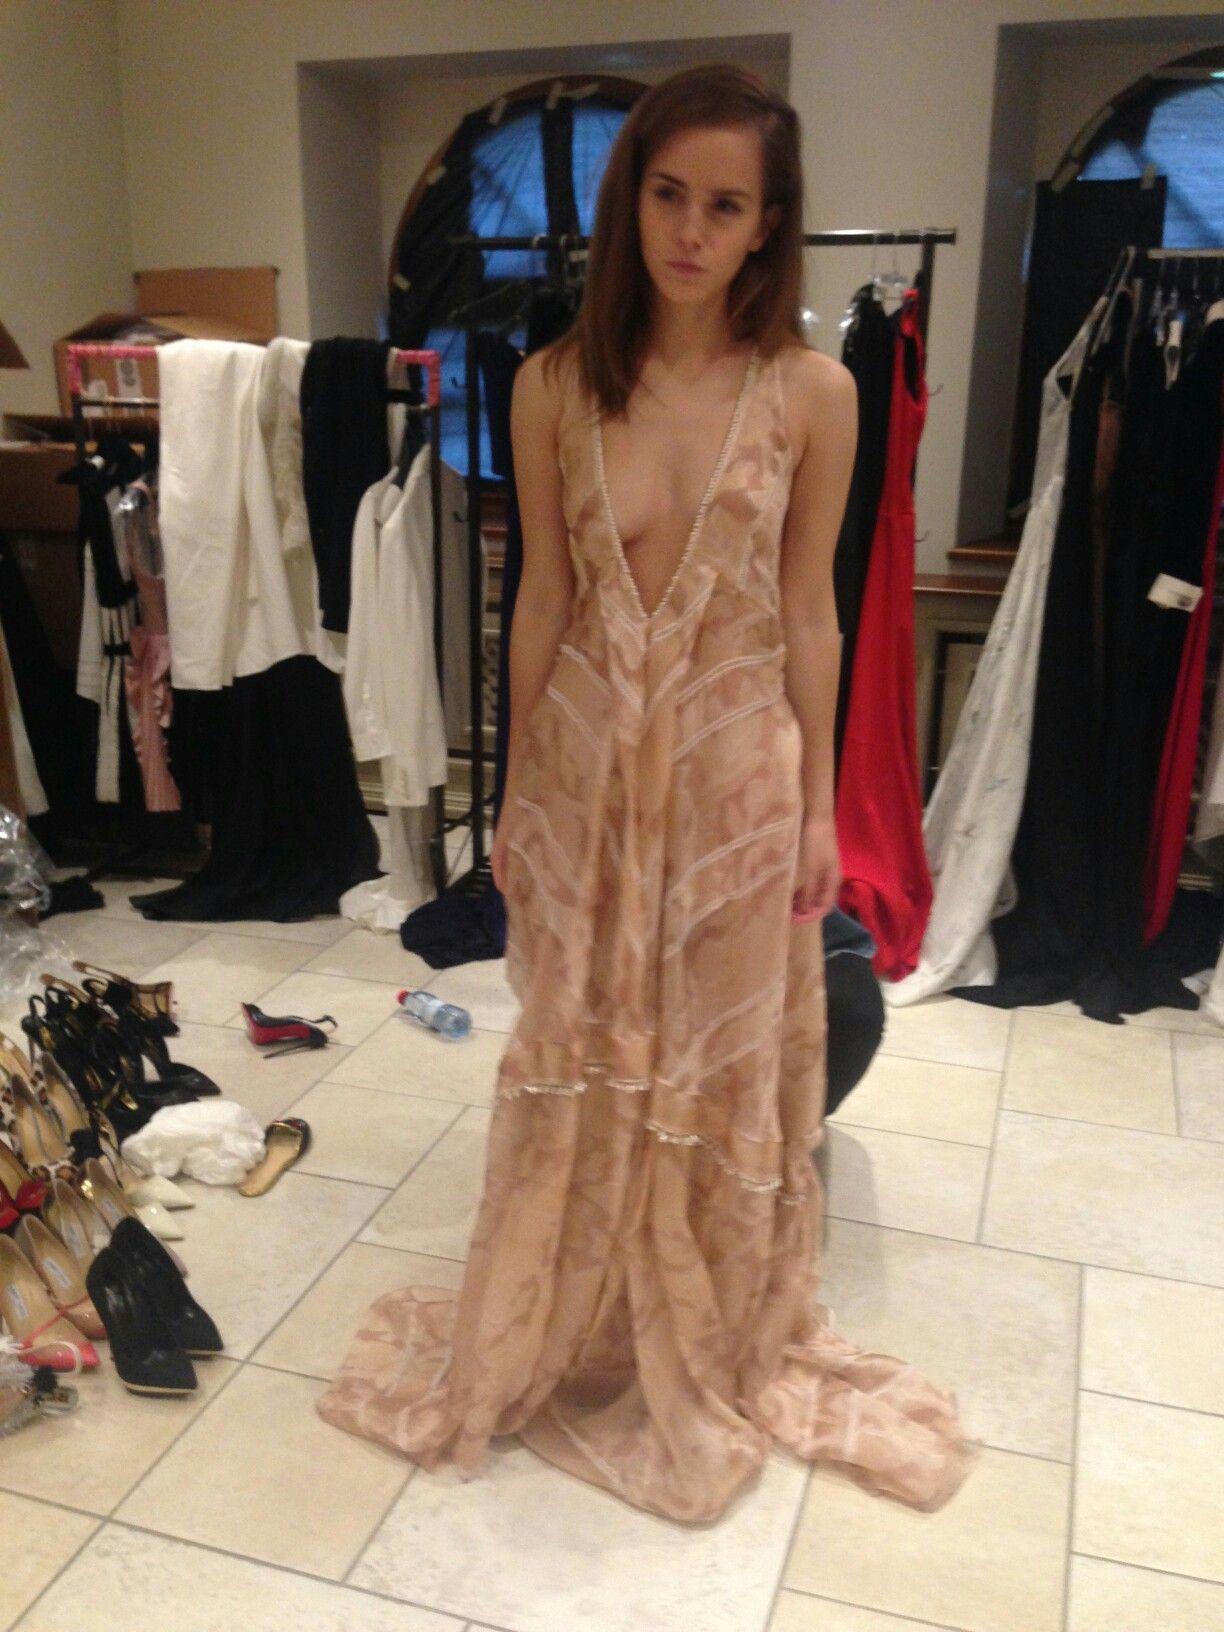 Emma Watson Trying On Dresses